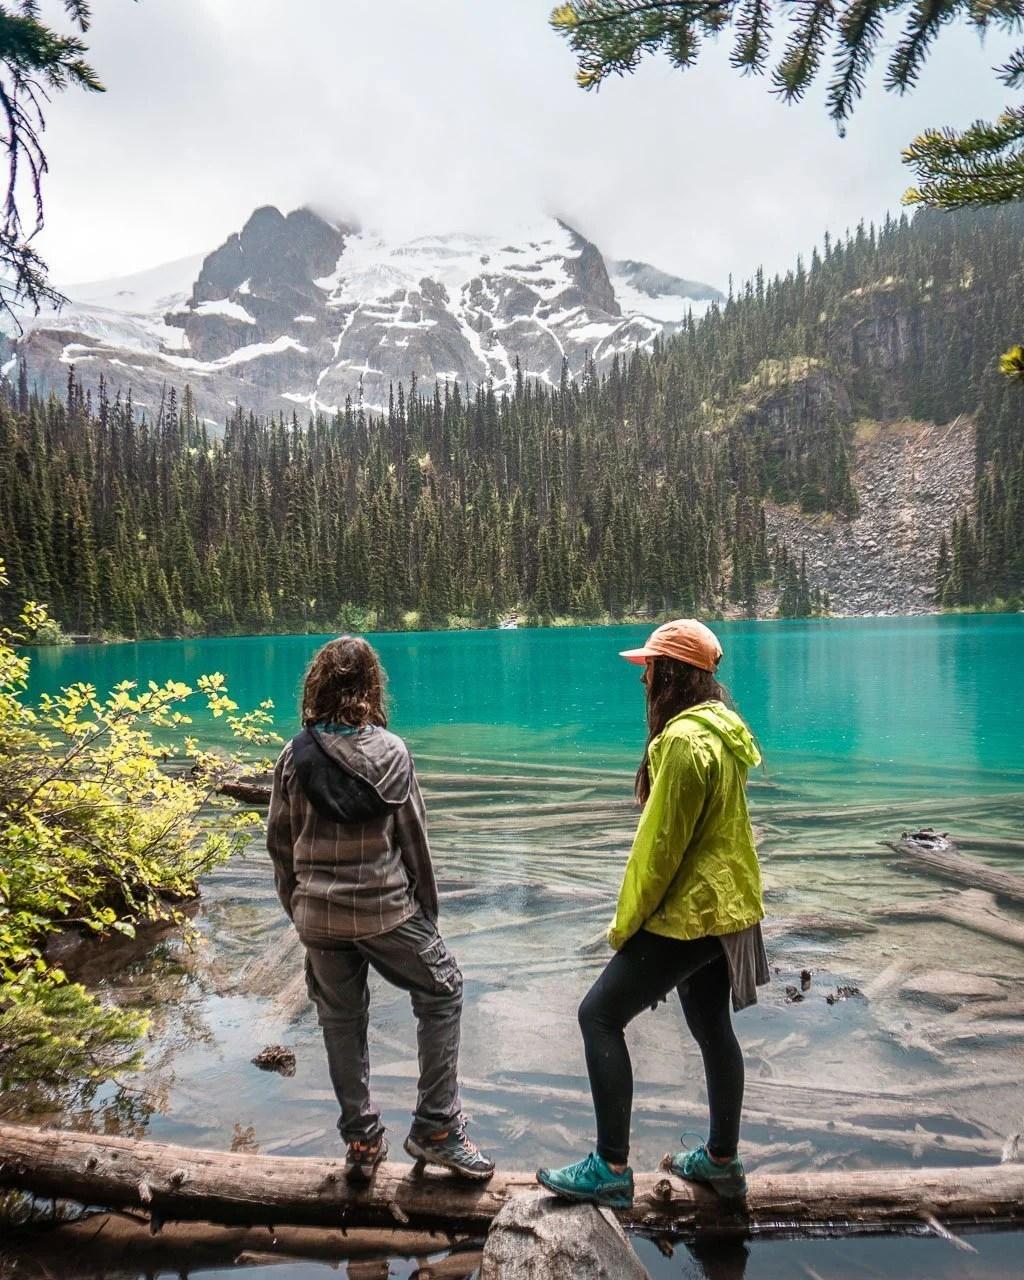 Iconic Joffre Lakes near Whistler